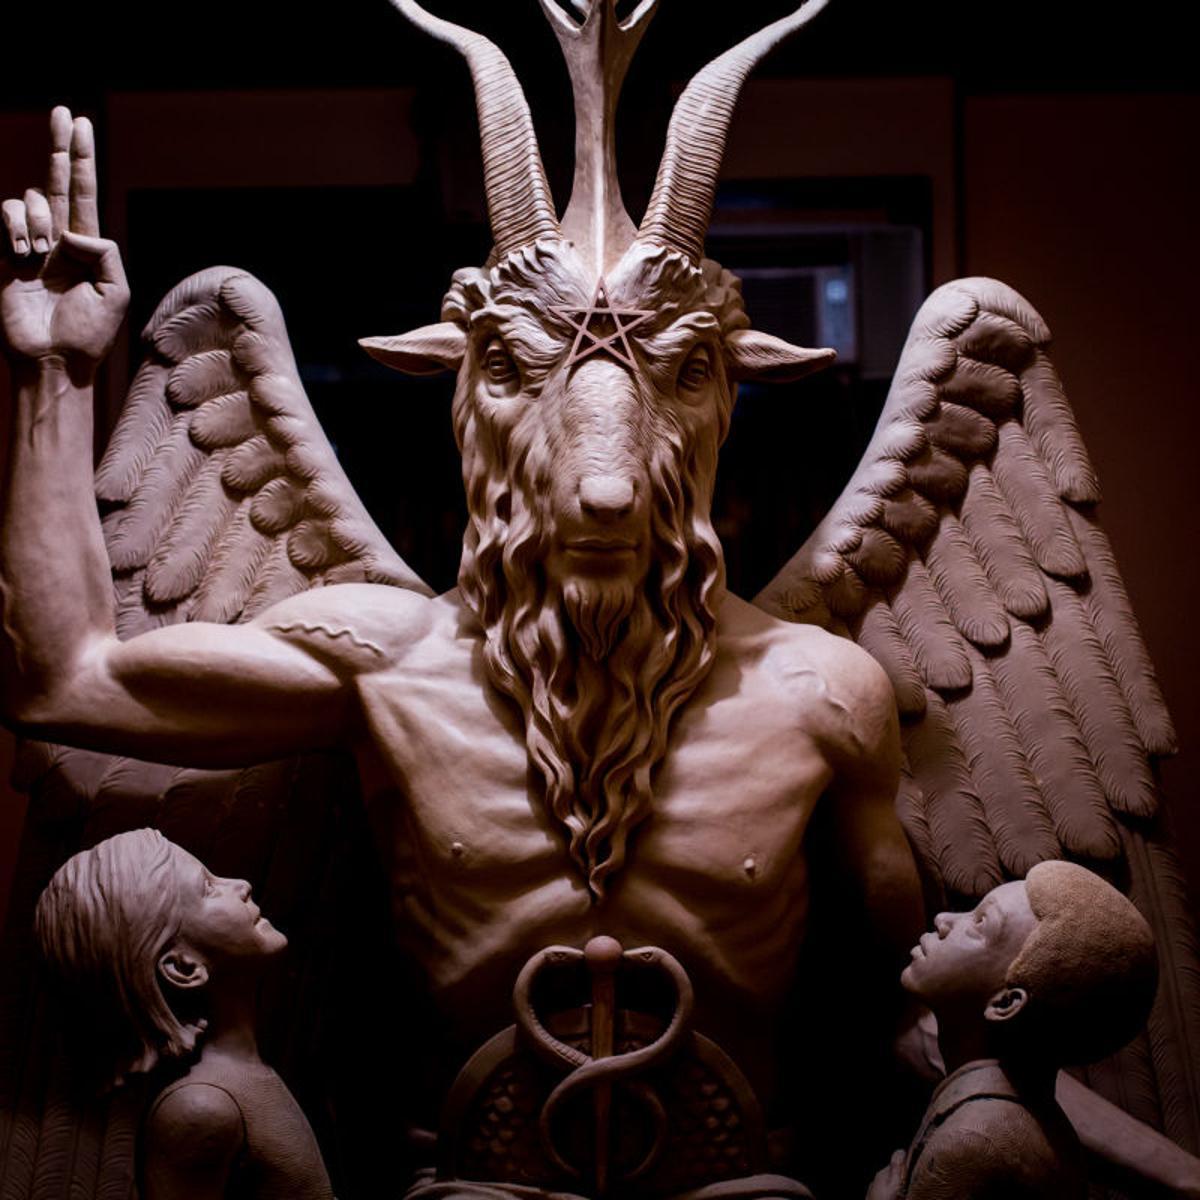 Phoenix Freaks Out Over Tucsonan S Satanic Prayer Latest Tim Steller Columns Tucson Com